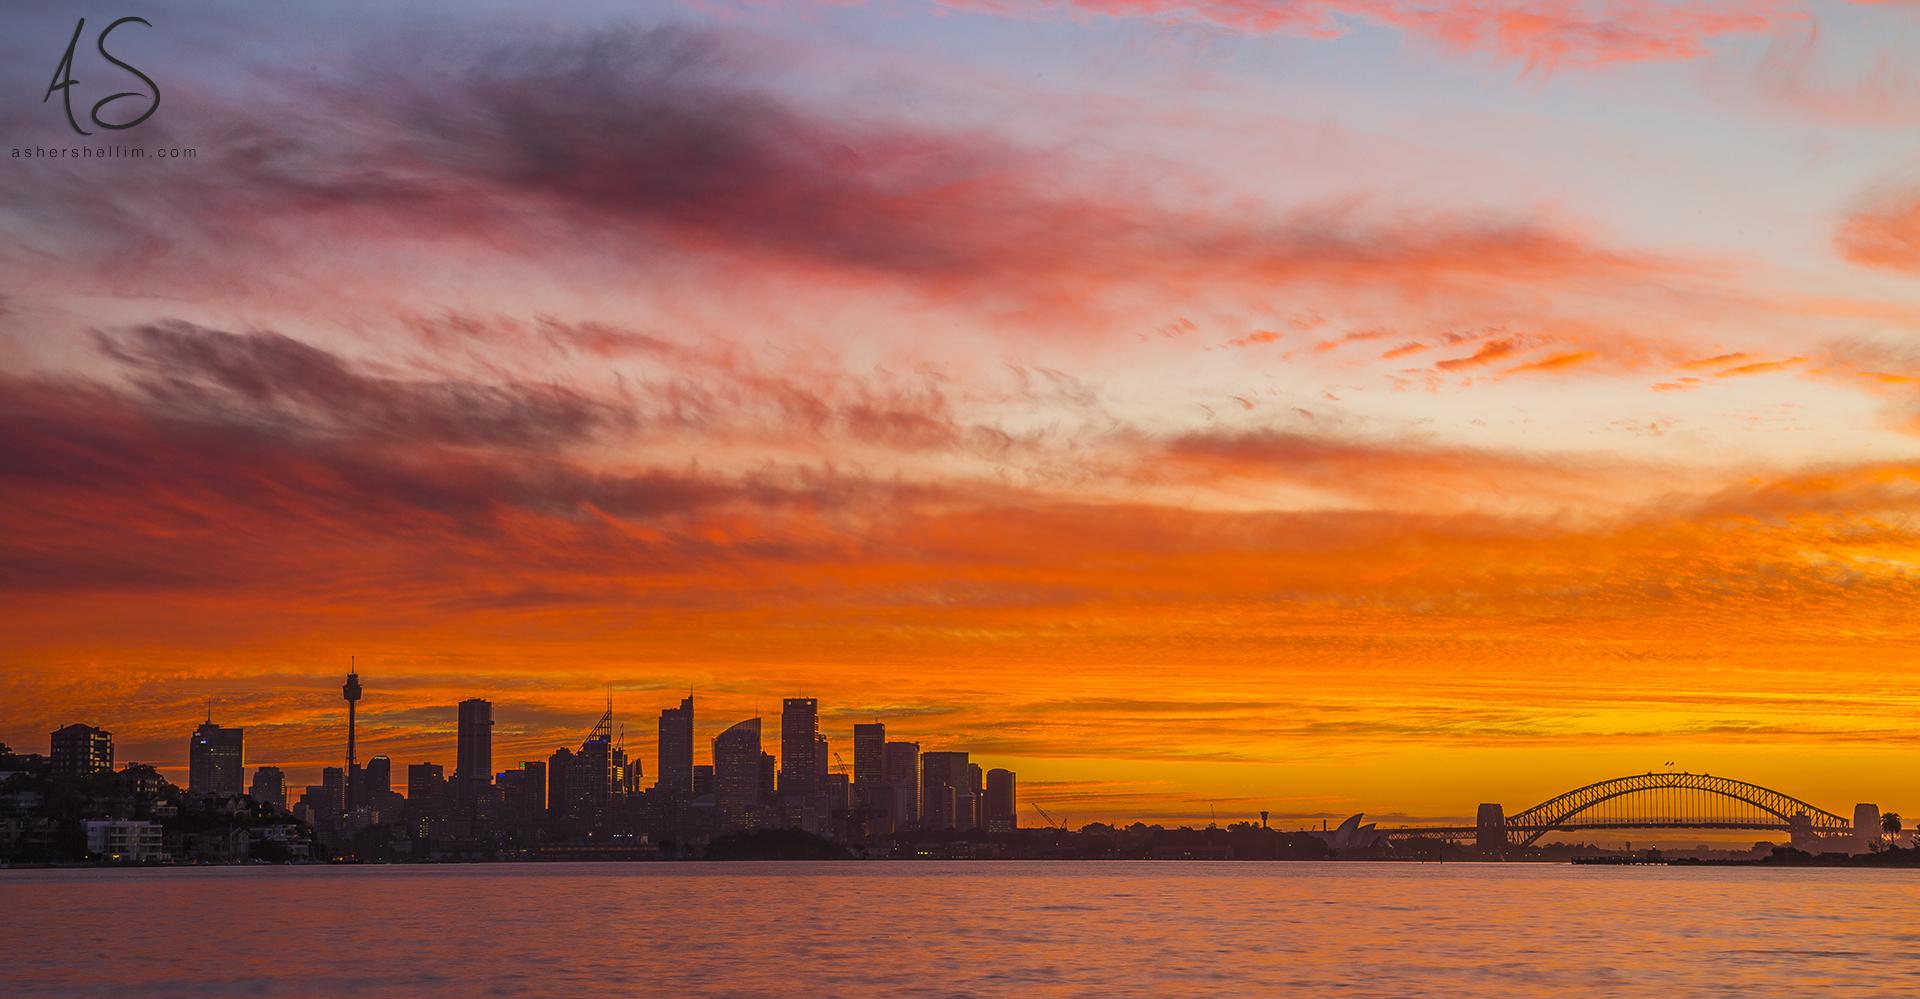 Sydney / 5:03 PM 12 June 2014